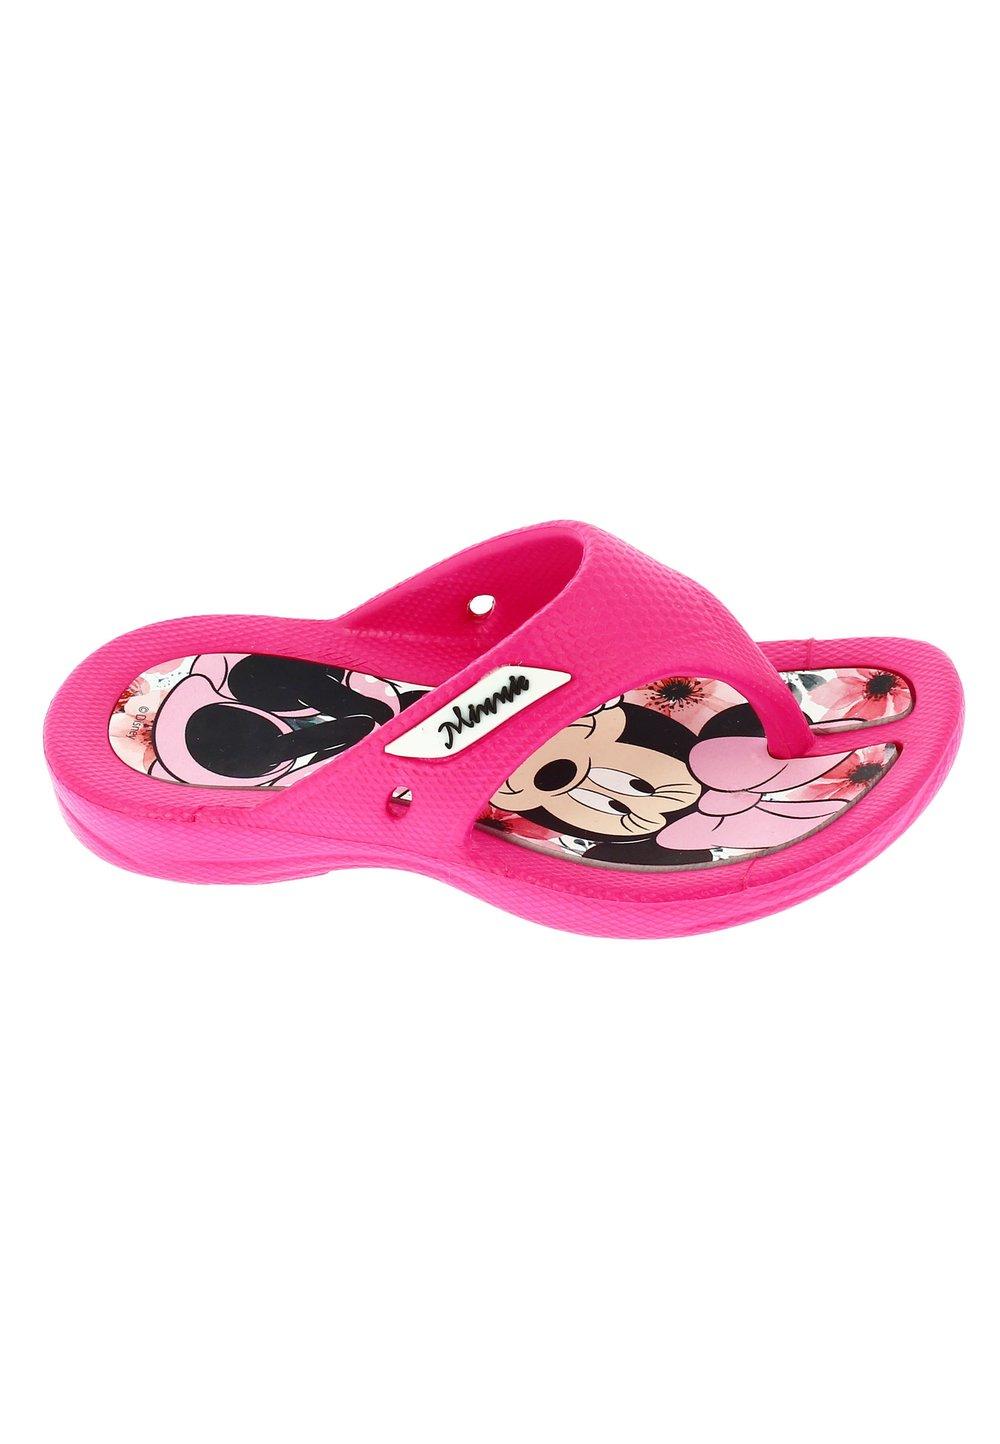 Papuci flip flop, Minnie , roz inchis imagine